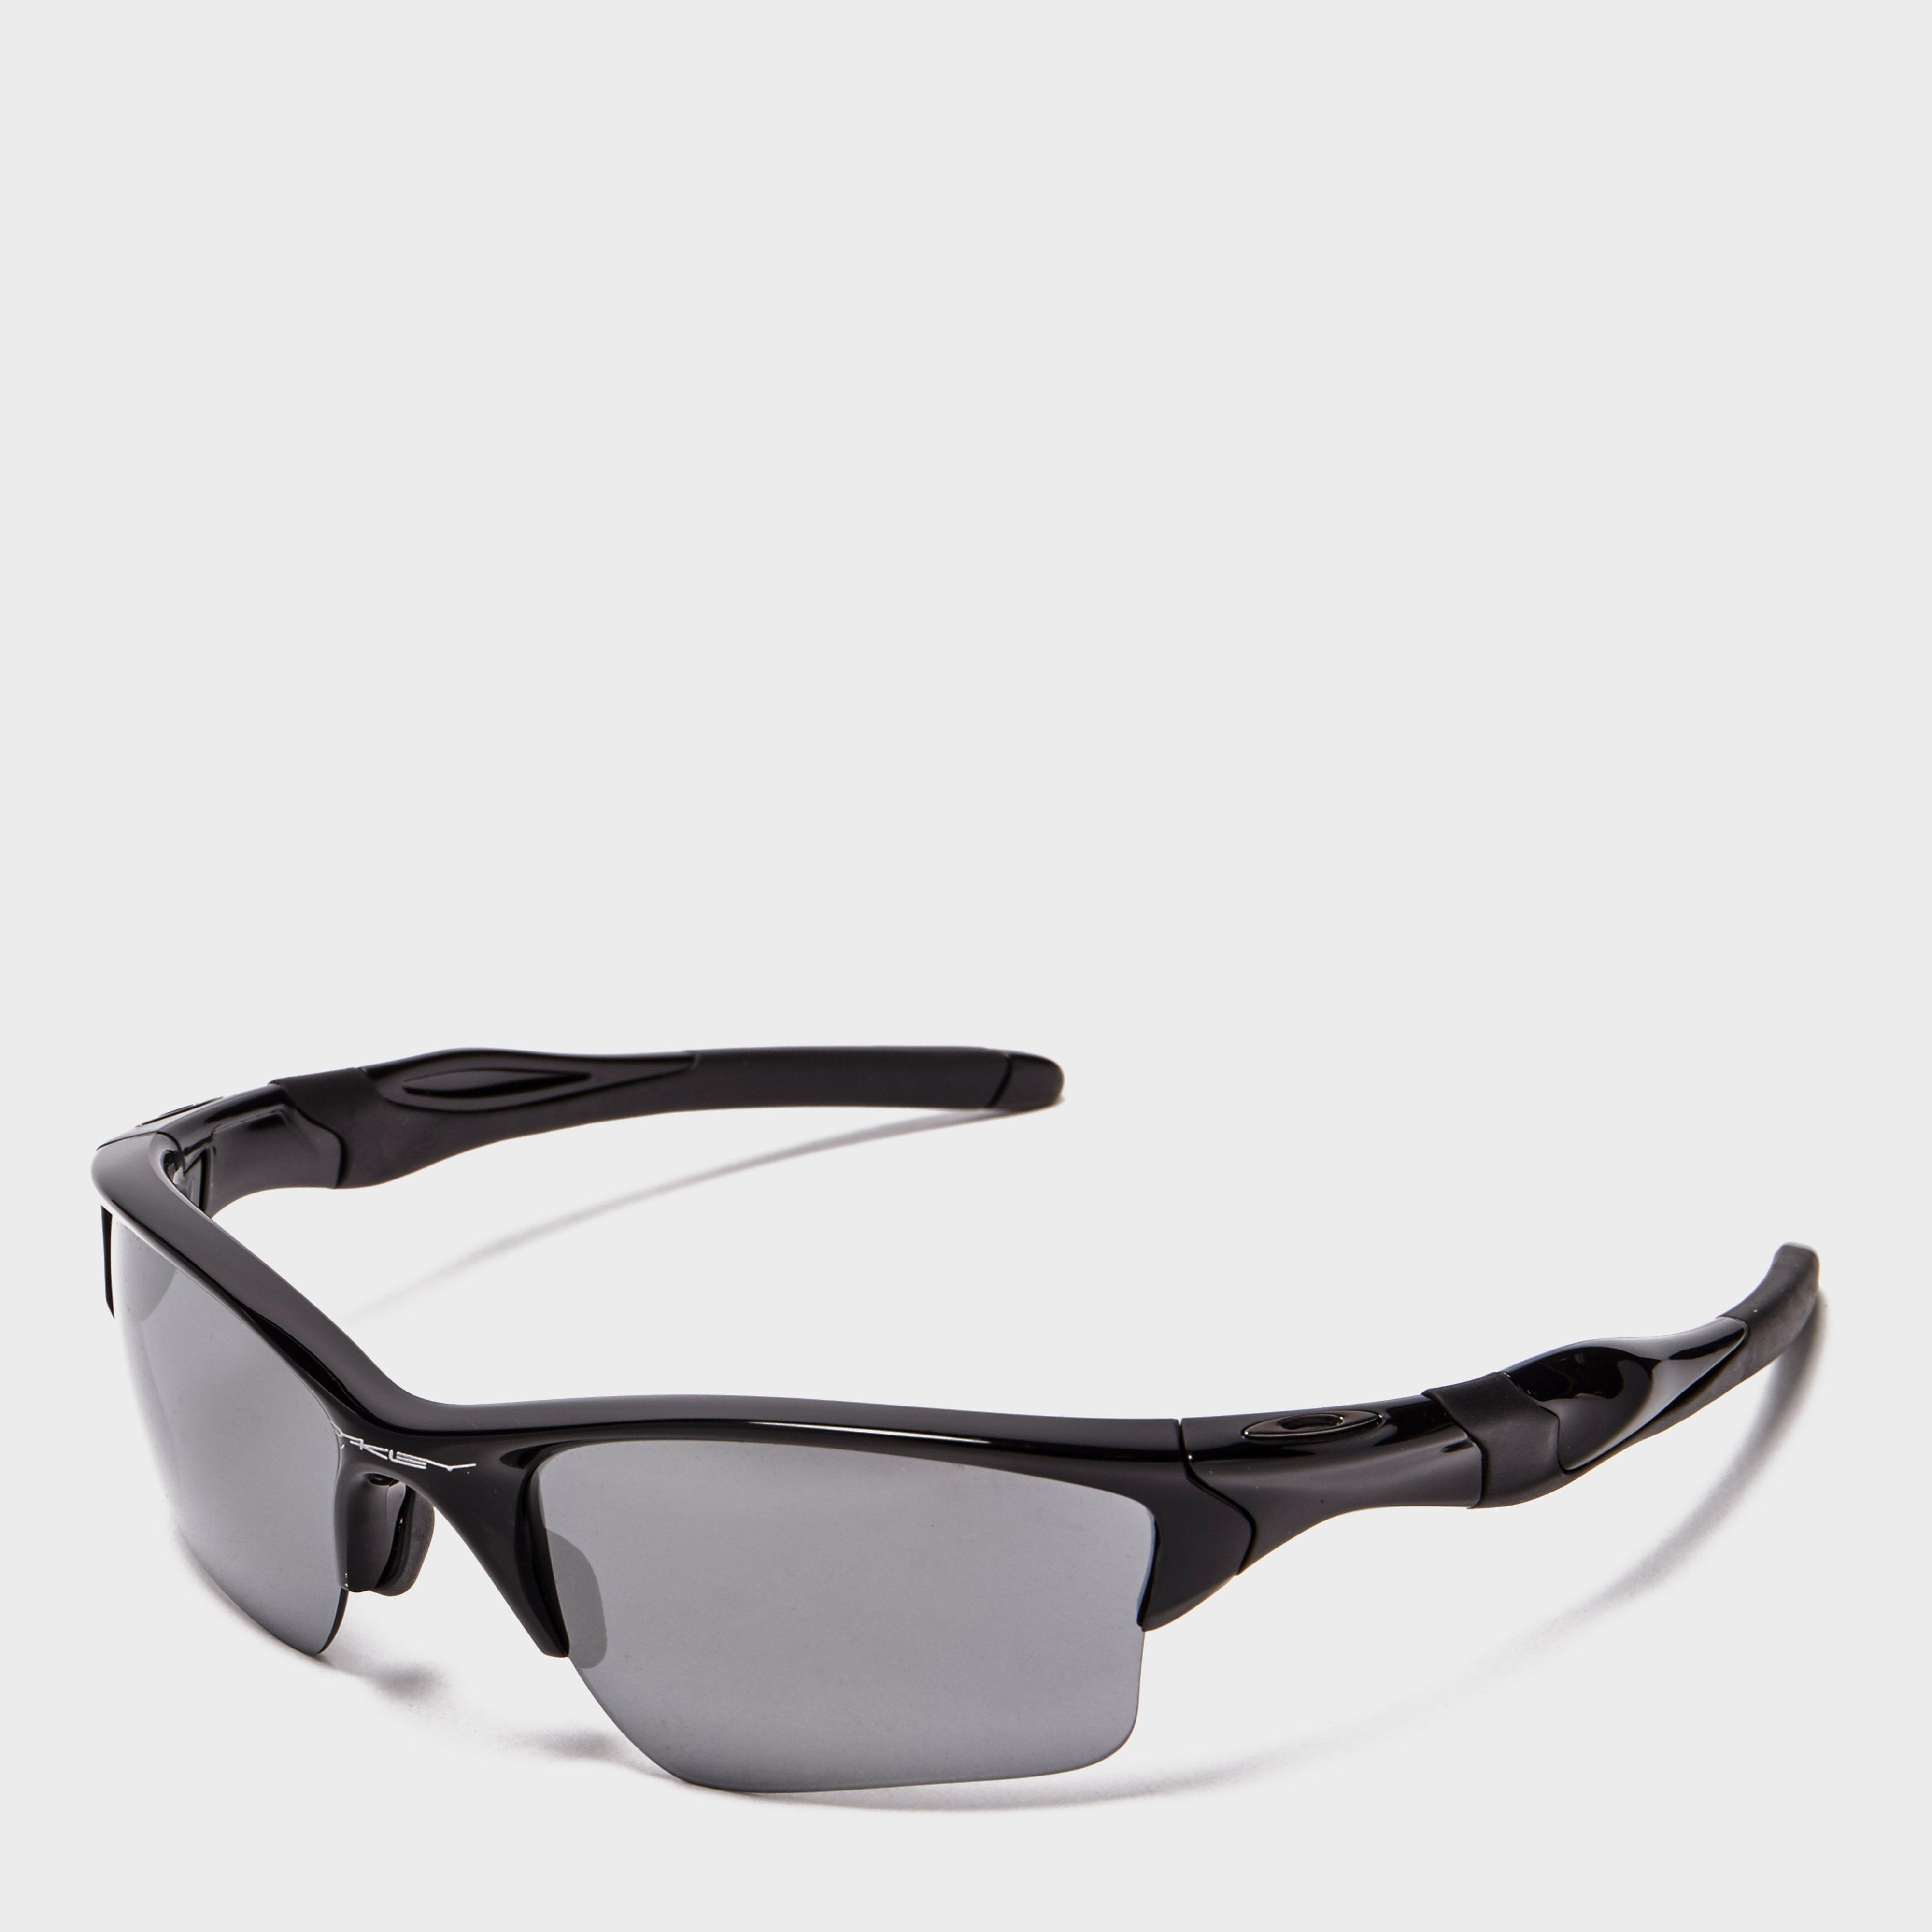 c825300b16 Oakley Half Jacket® 2.0XL Black Iridium Sunglasses